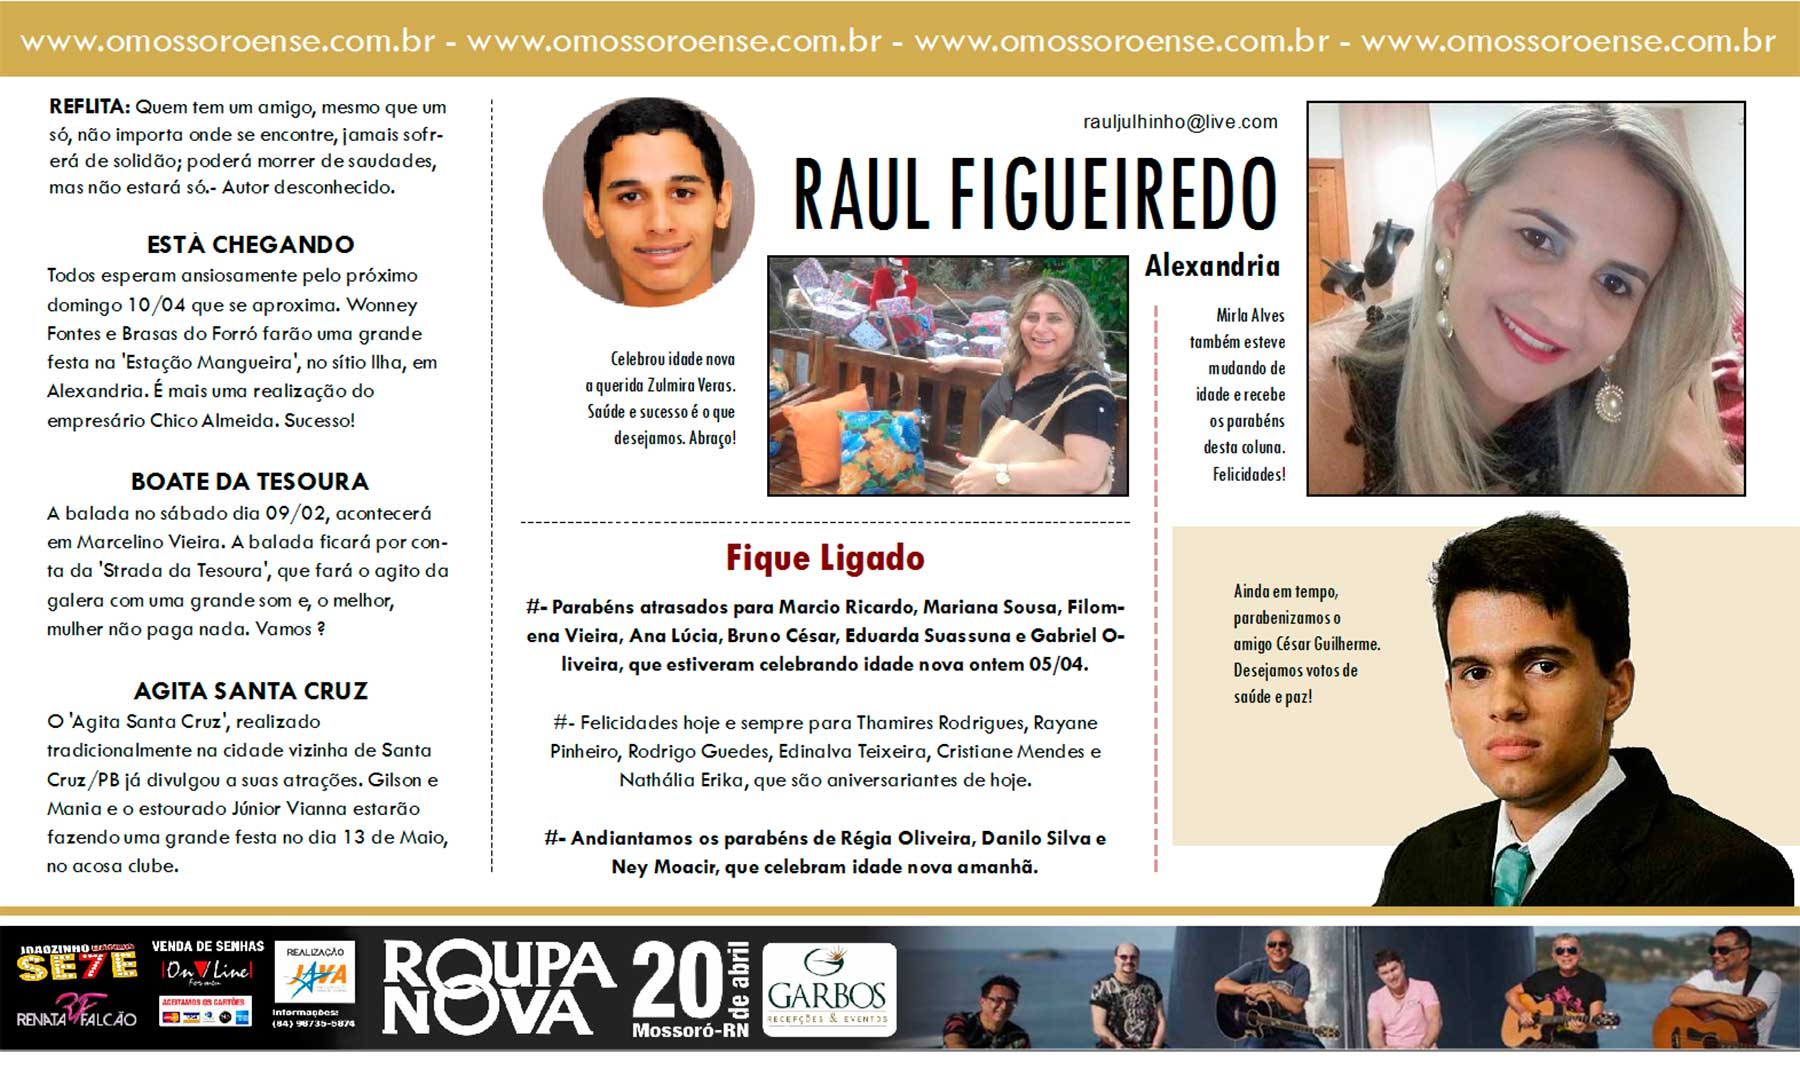 RAUL-FIGUEIREDO---09-03-2016